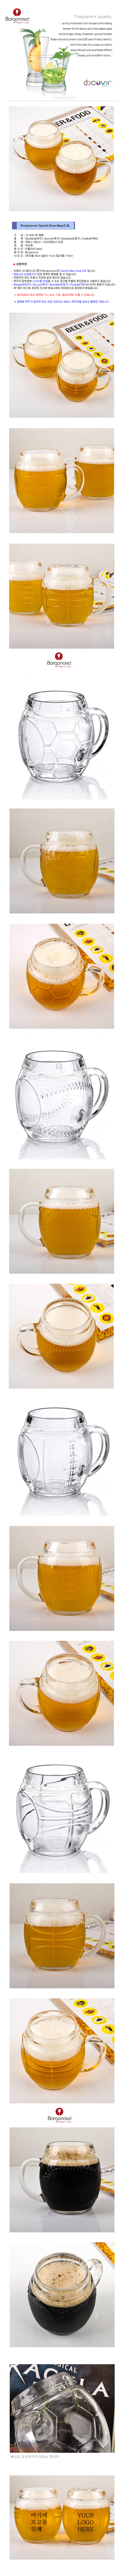 Borgonovo Sports Beer Mug (맥주잔) 0.5L (2P 4P) - 더리빙샵, 11,500원, 유리컵/술잔, 유리컵